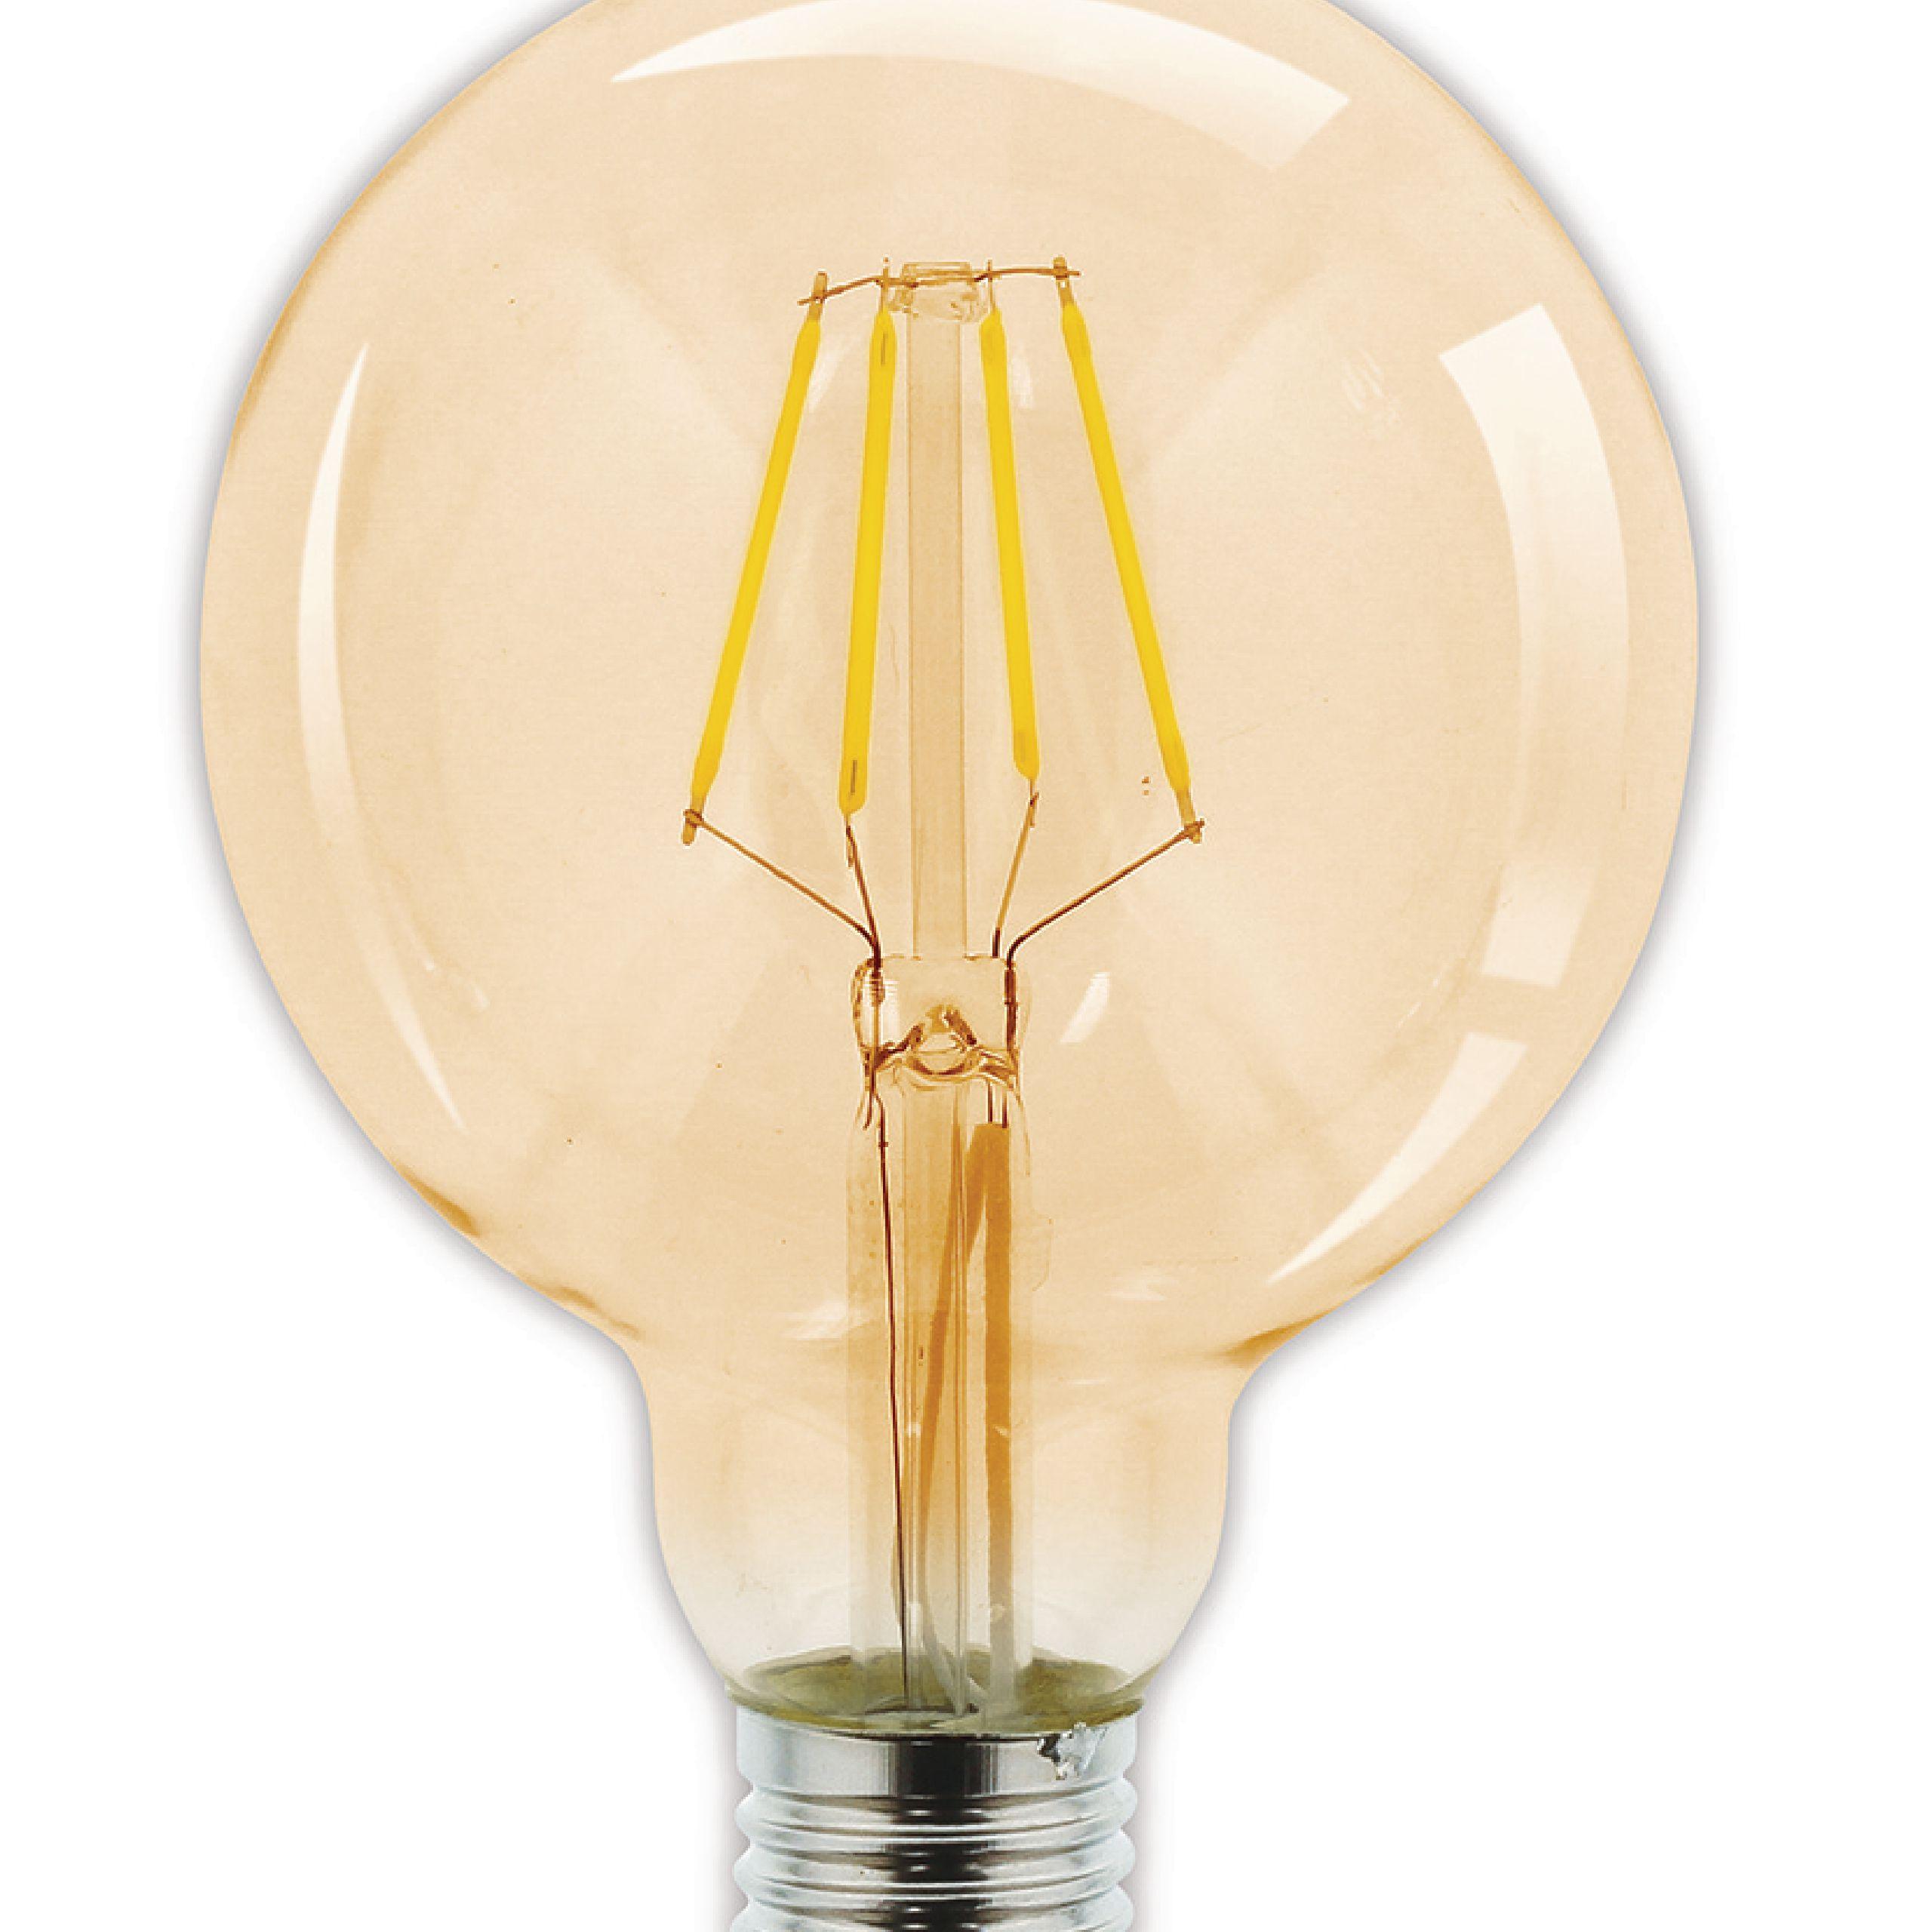 HQ LED žárovka vláknová E27 G95 2.8W 200lm 2000K (HQLFE27G95004)